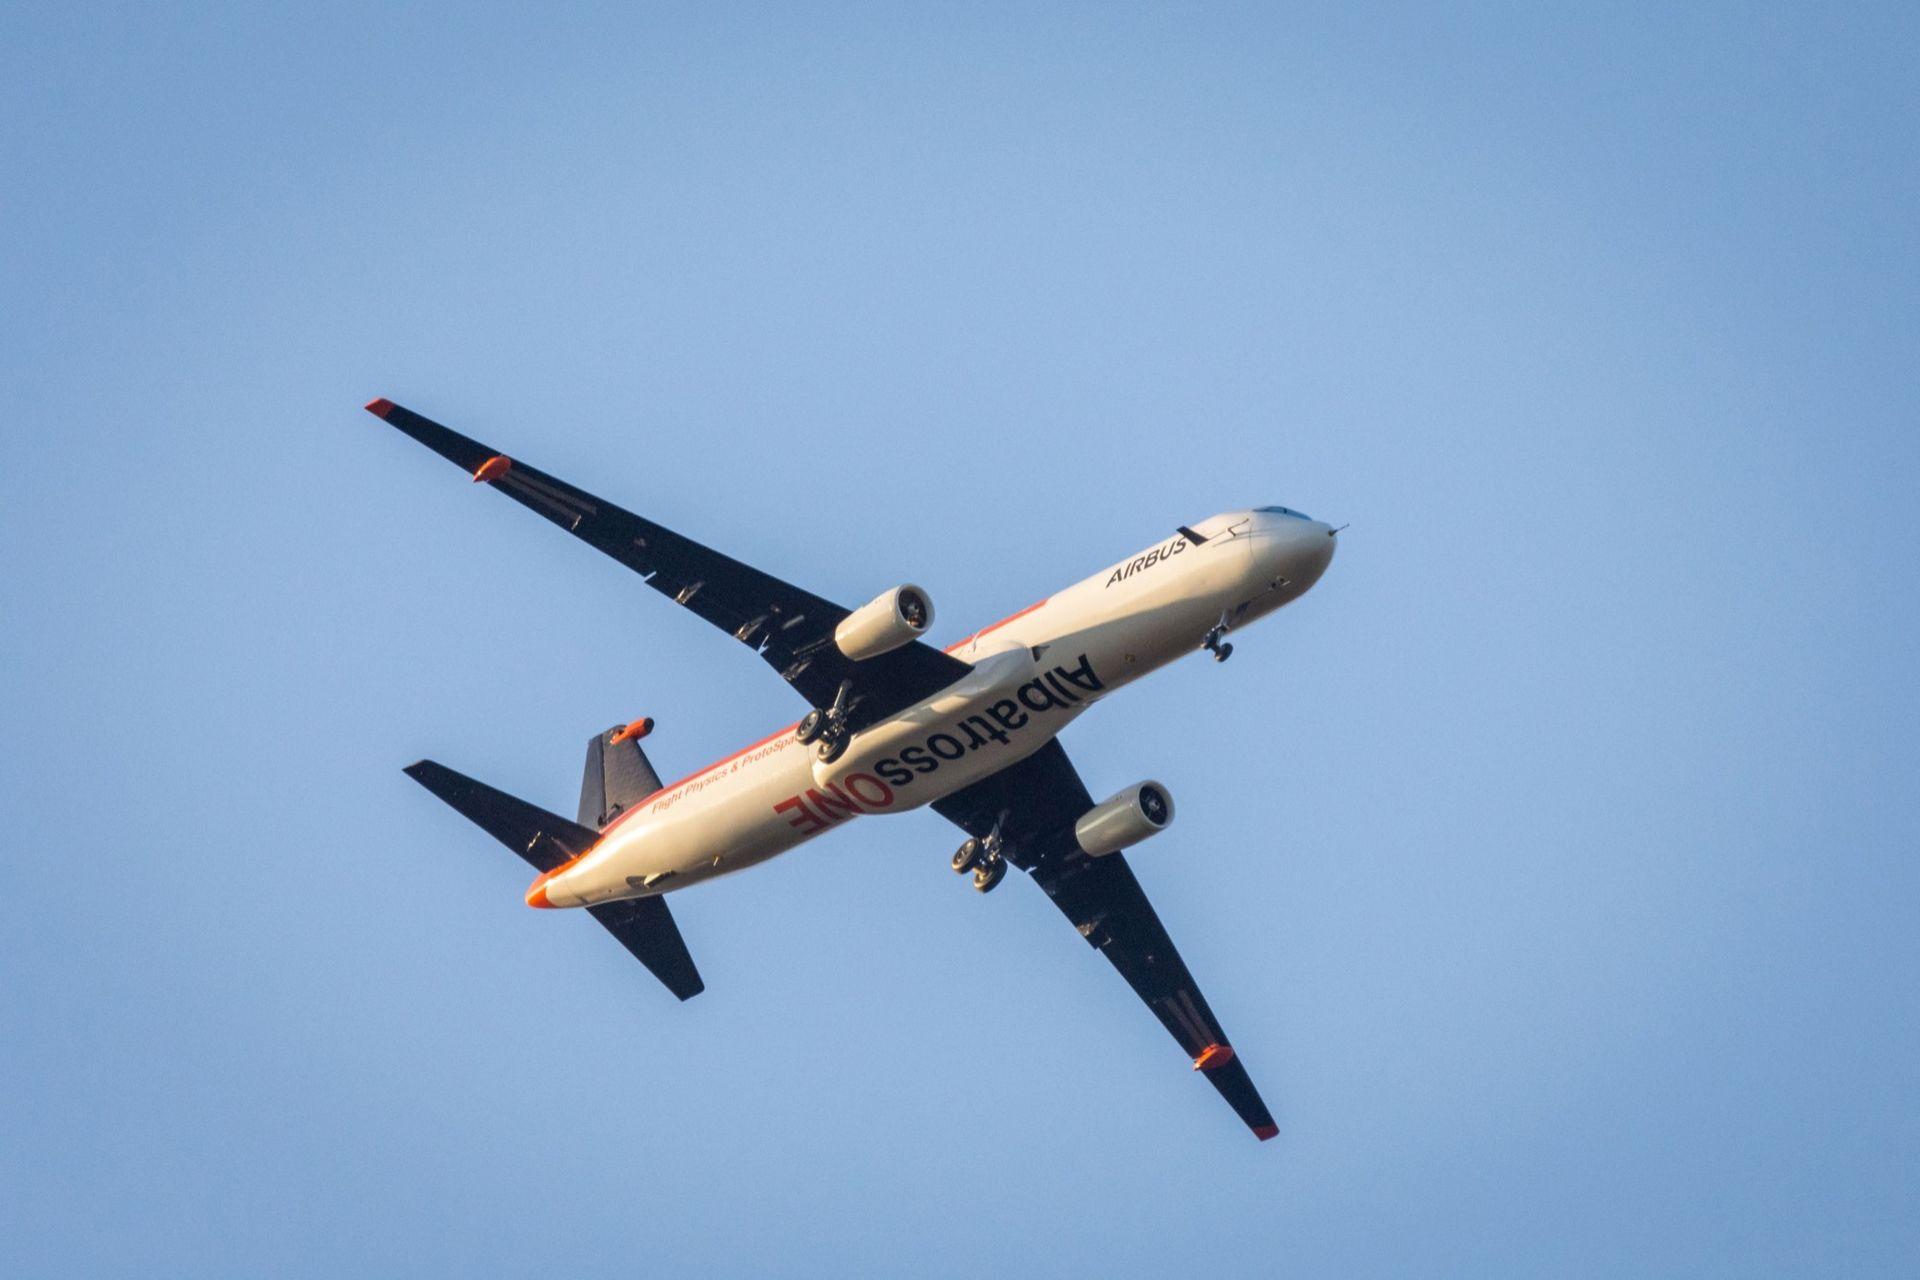 Airbus AlbatrossOne flaxar med vingarna som en fågel